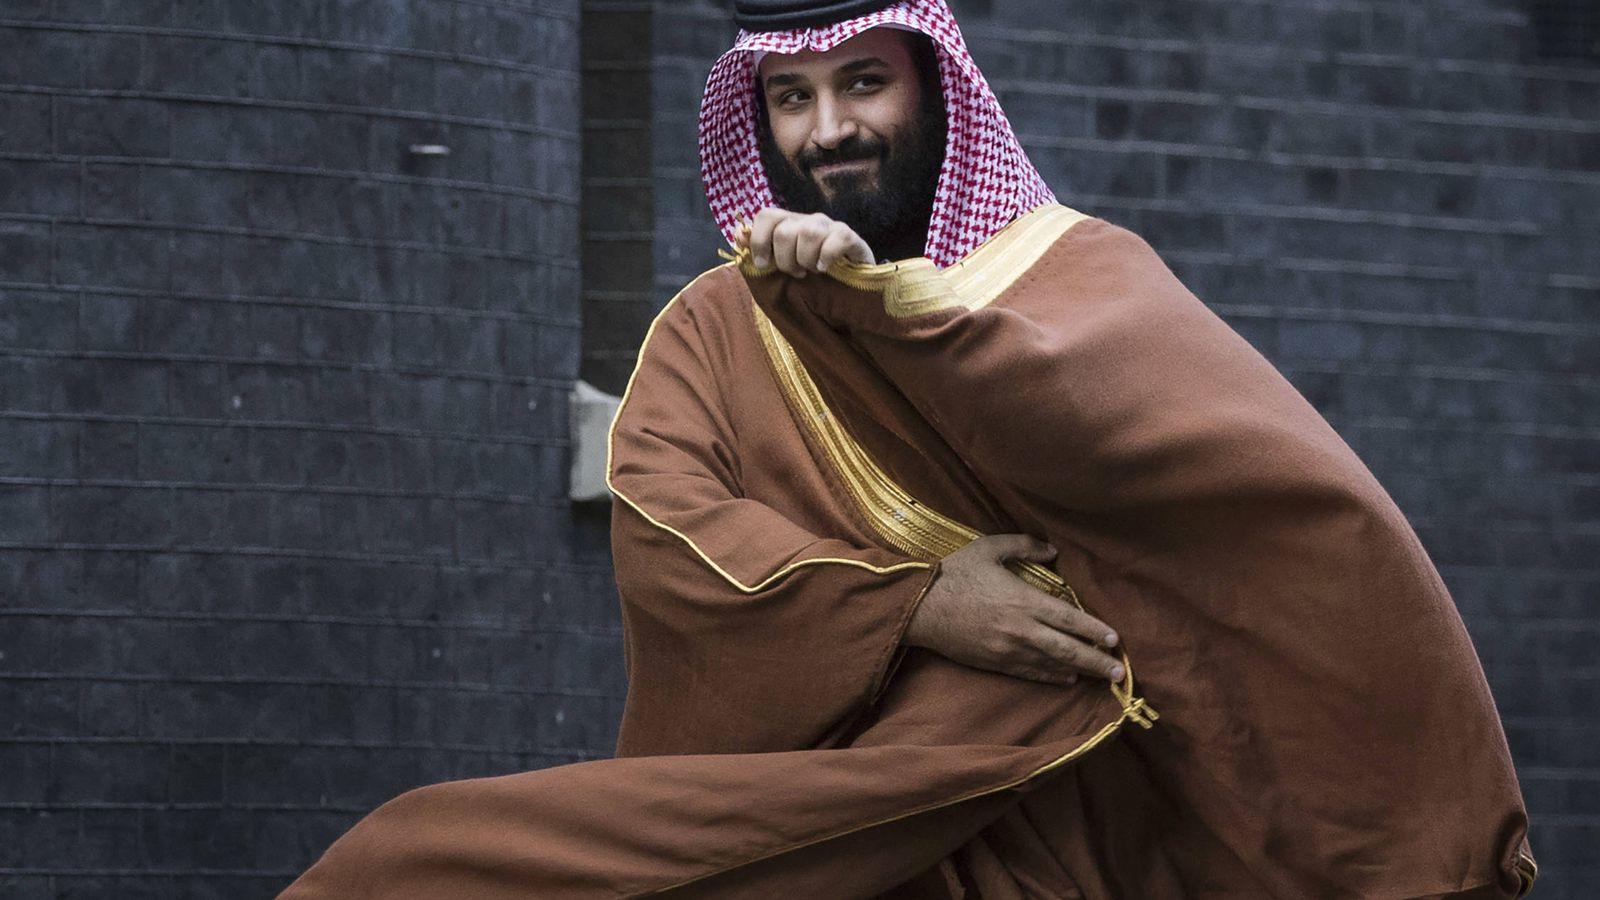 Foto:  Mohamed bin Salman, príncipe herdero de Arabia Saudita. (Getty)